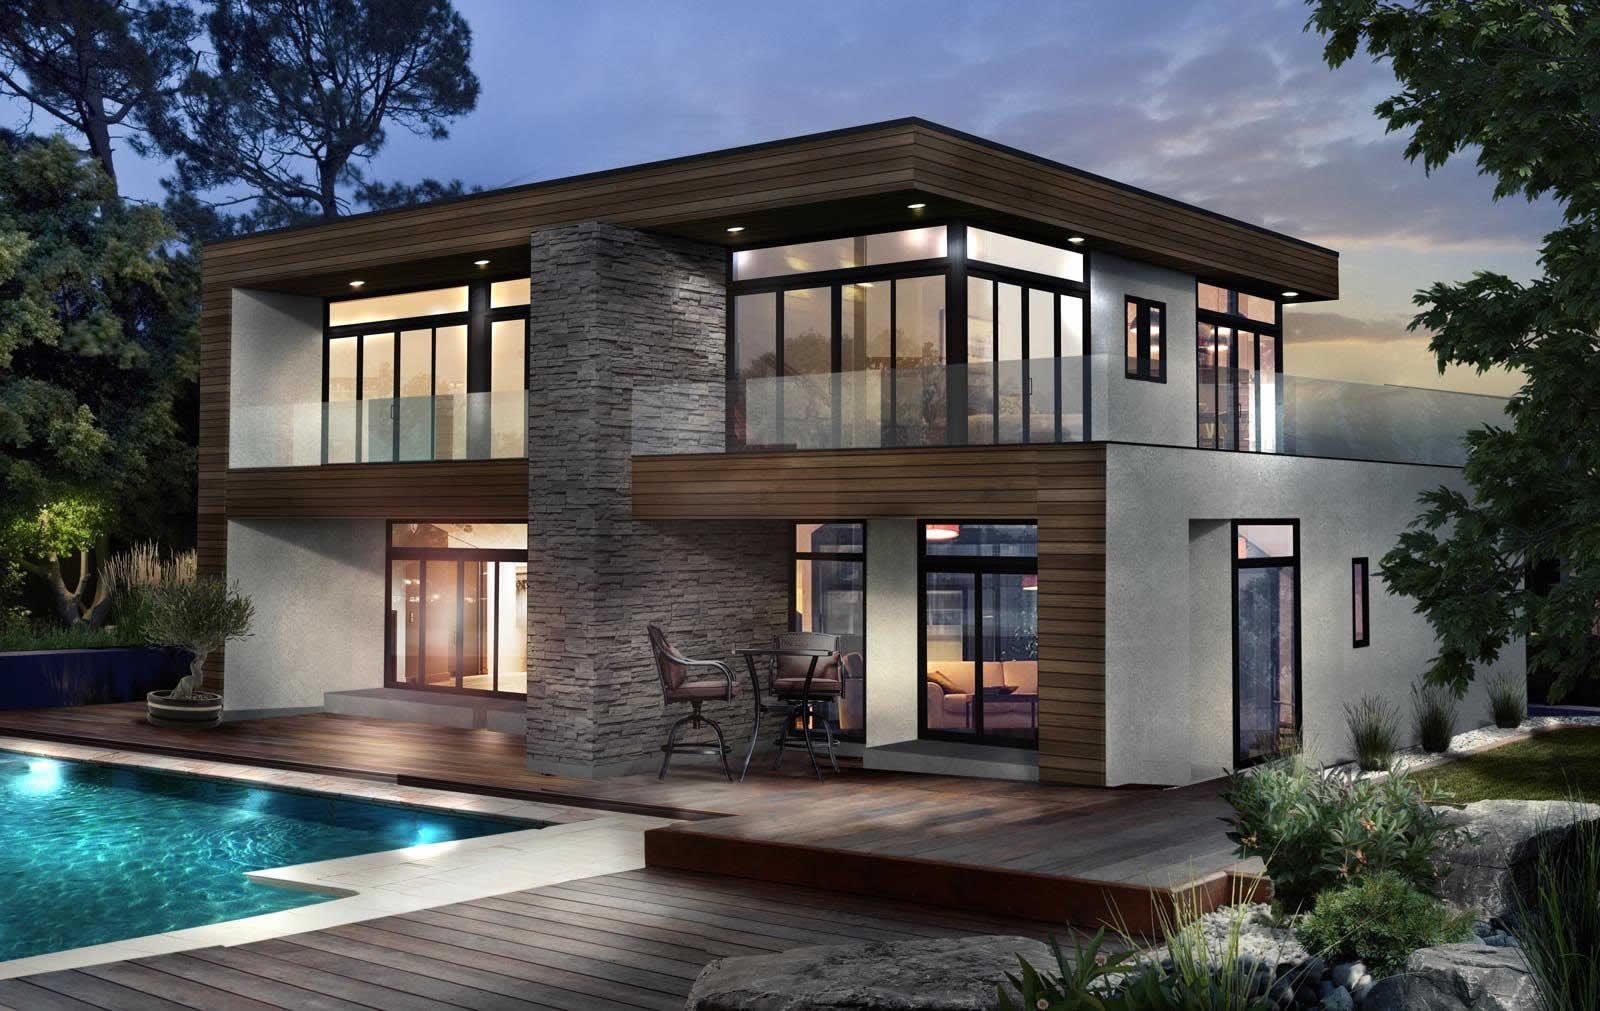 Agence immobili re barnes canada sp cialiste de l 39 immobilier de luxe for Villa de luxe canada